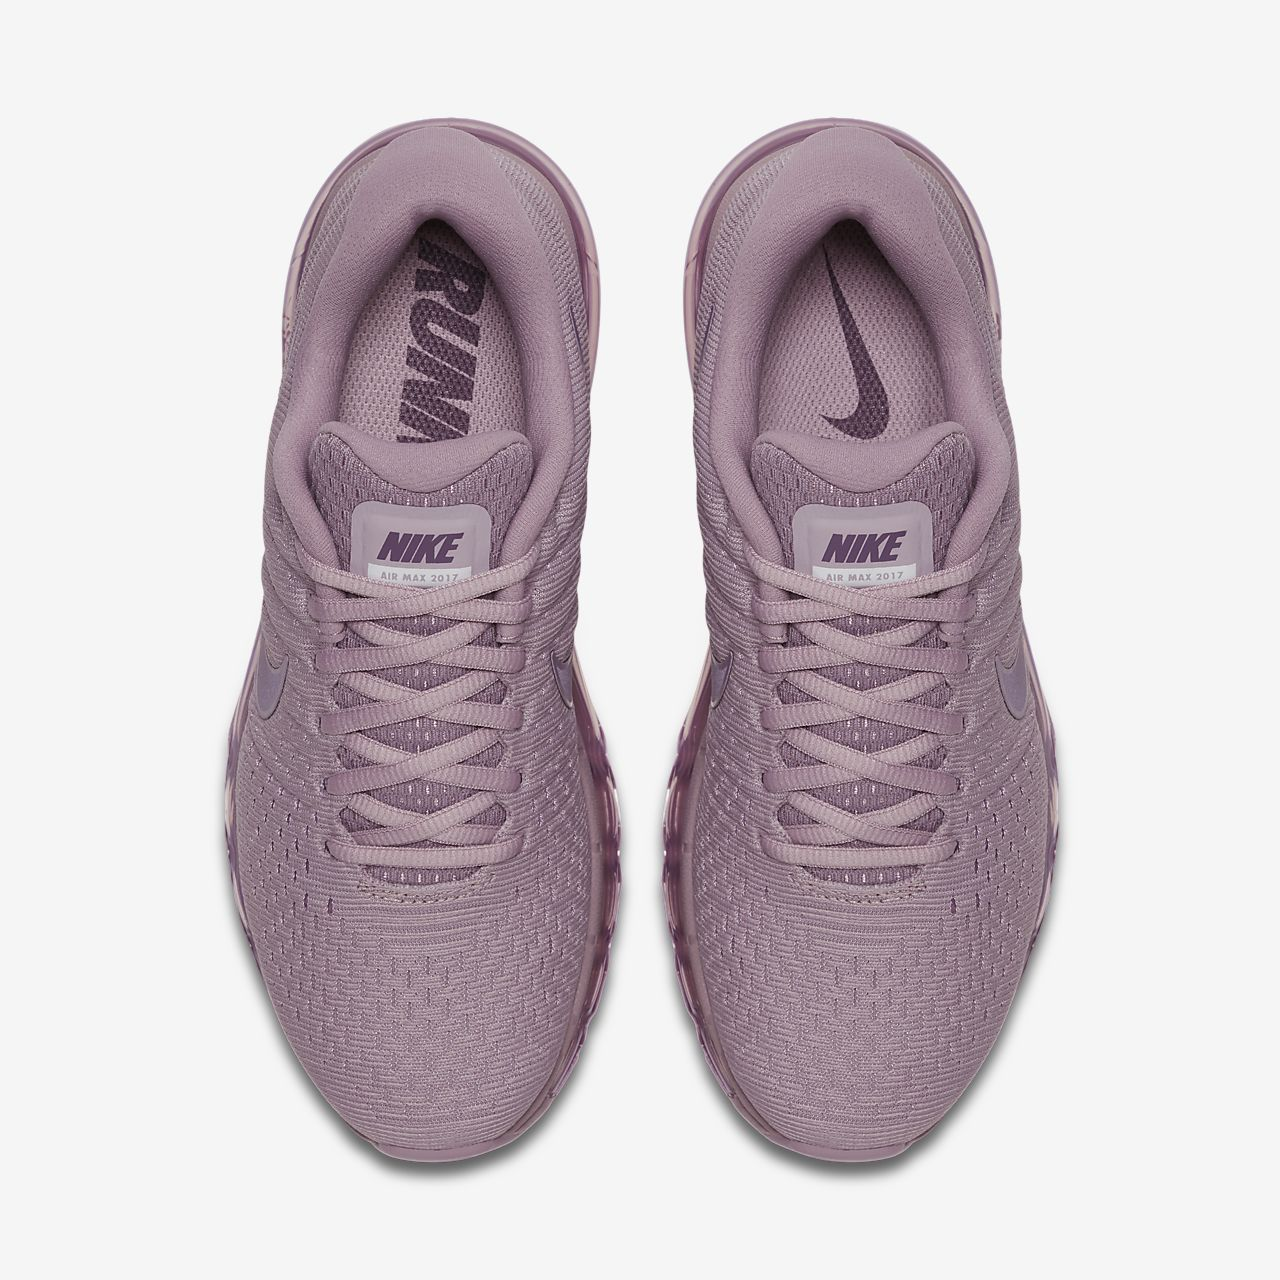 nike air max 2017 damen purple